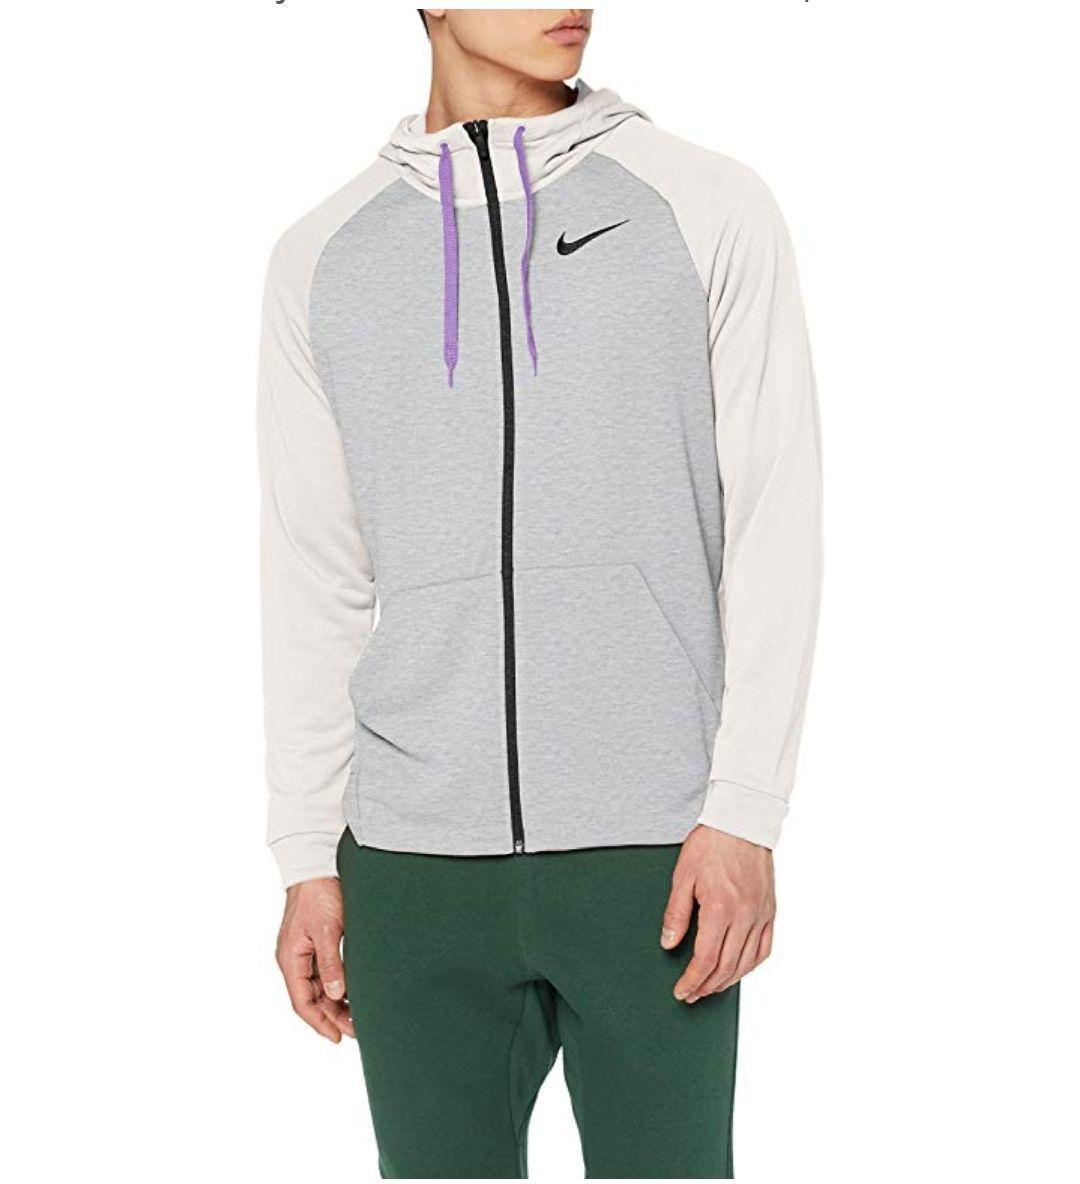 TALLA XL - Nike M Nk Dry Hoodie FZ Fleece Sweatshirt, Hombre